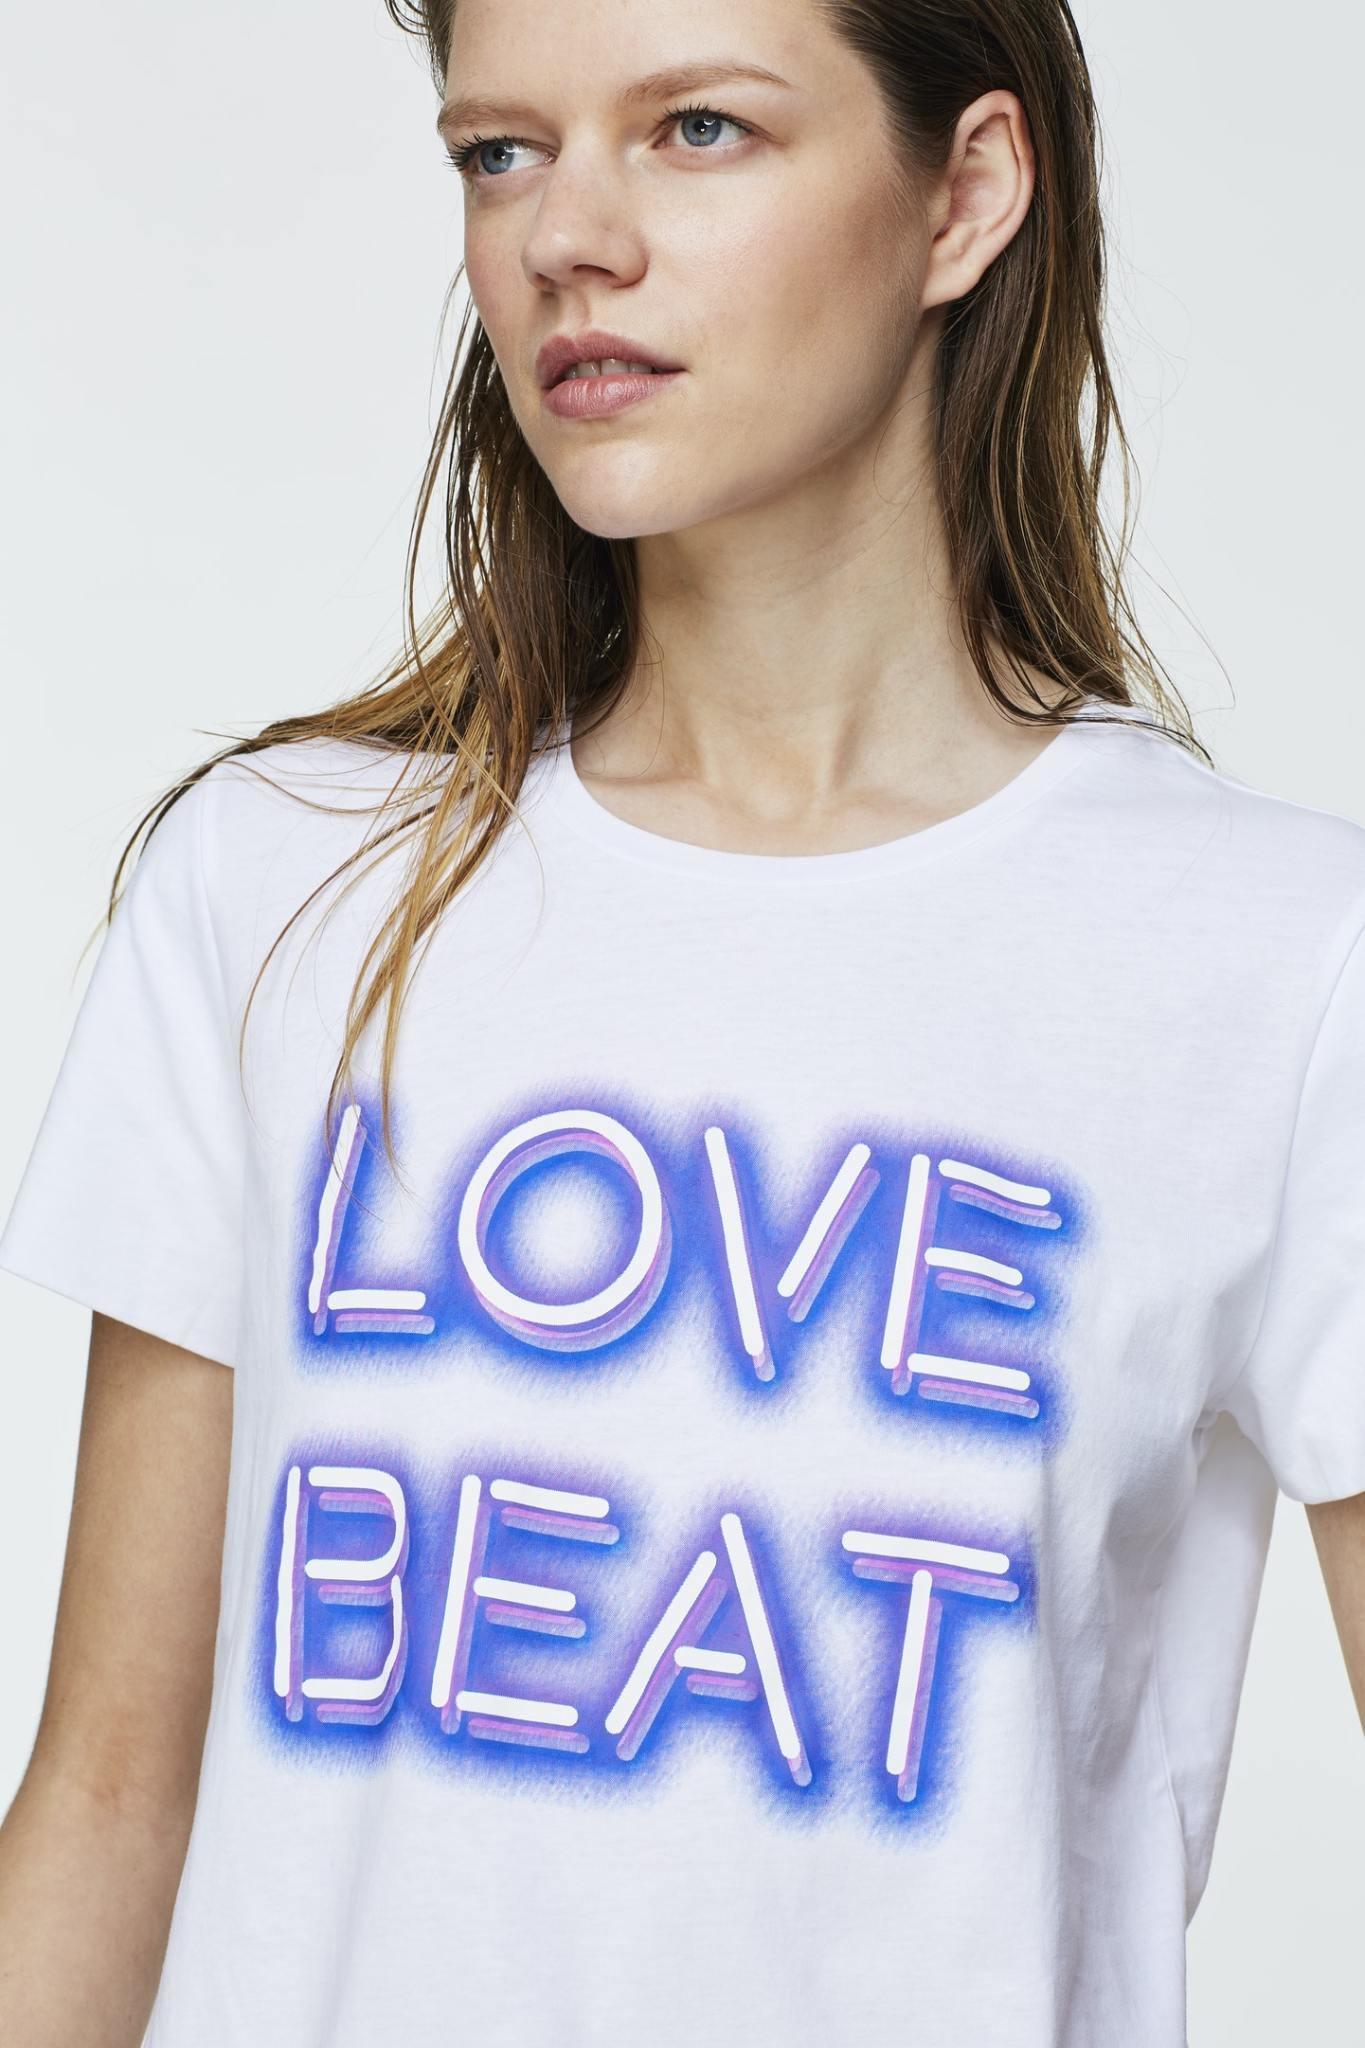 Neon love beat shirt dorothee schumacher-10